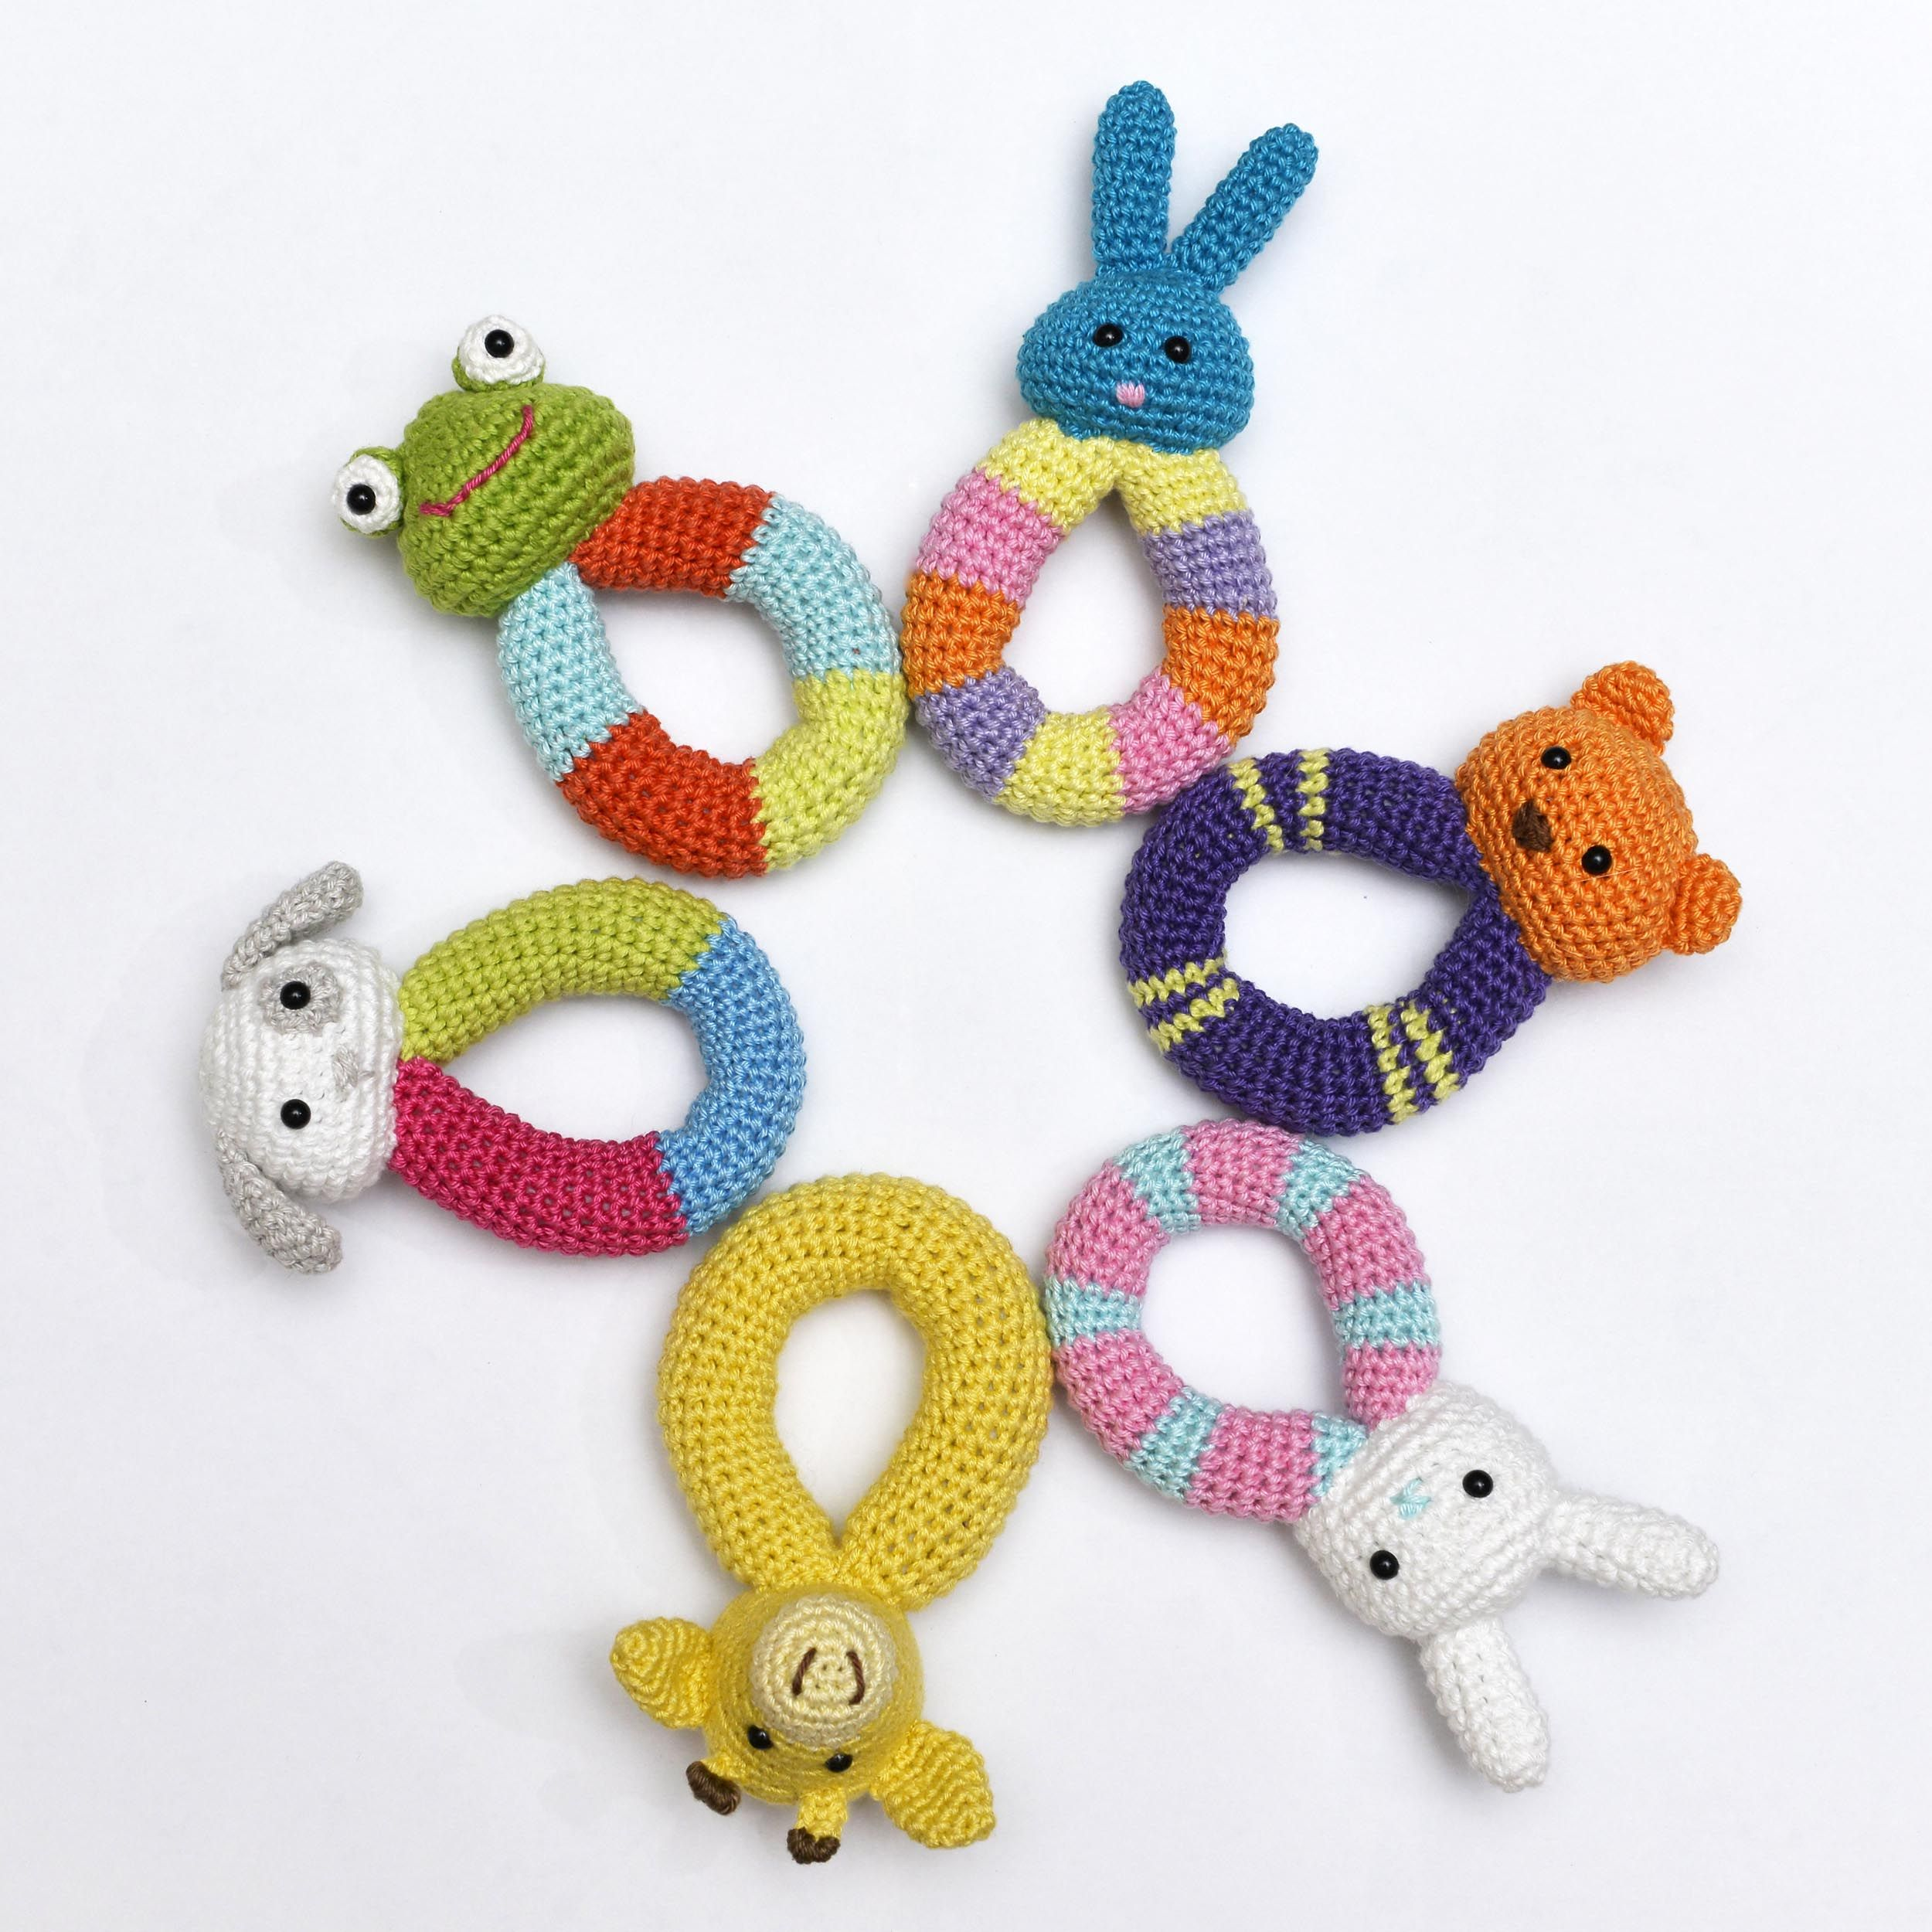 Pin de Kristine Skopane en Crochet/haken/tamborējumi | Pinterest ...